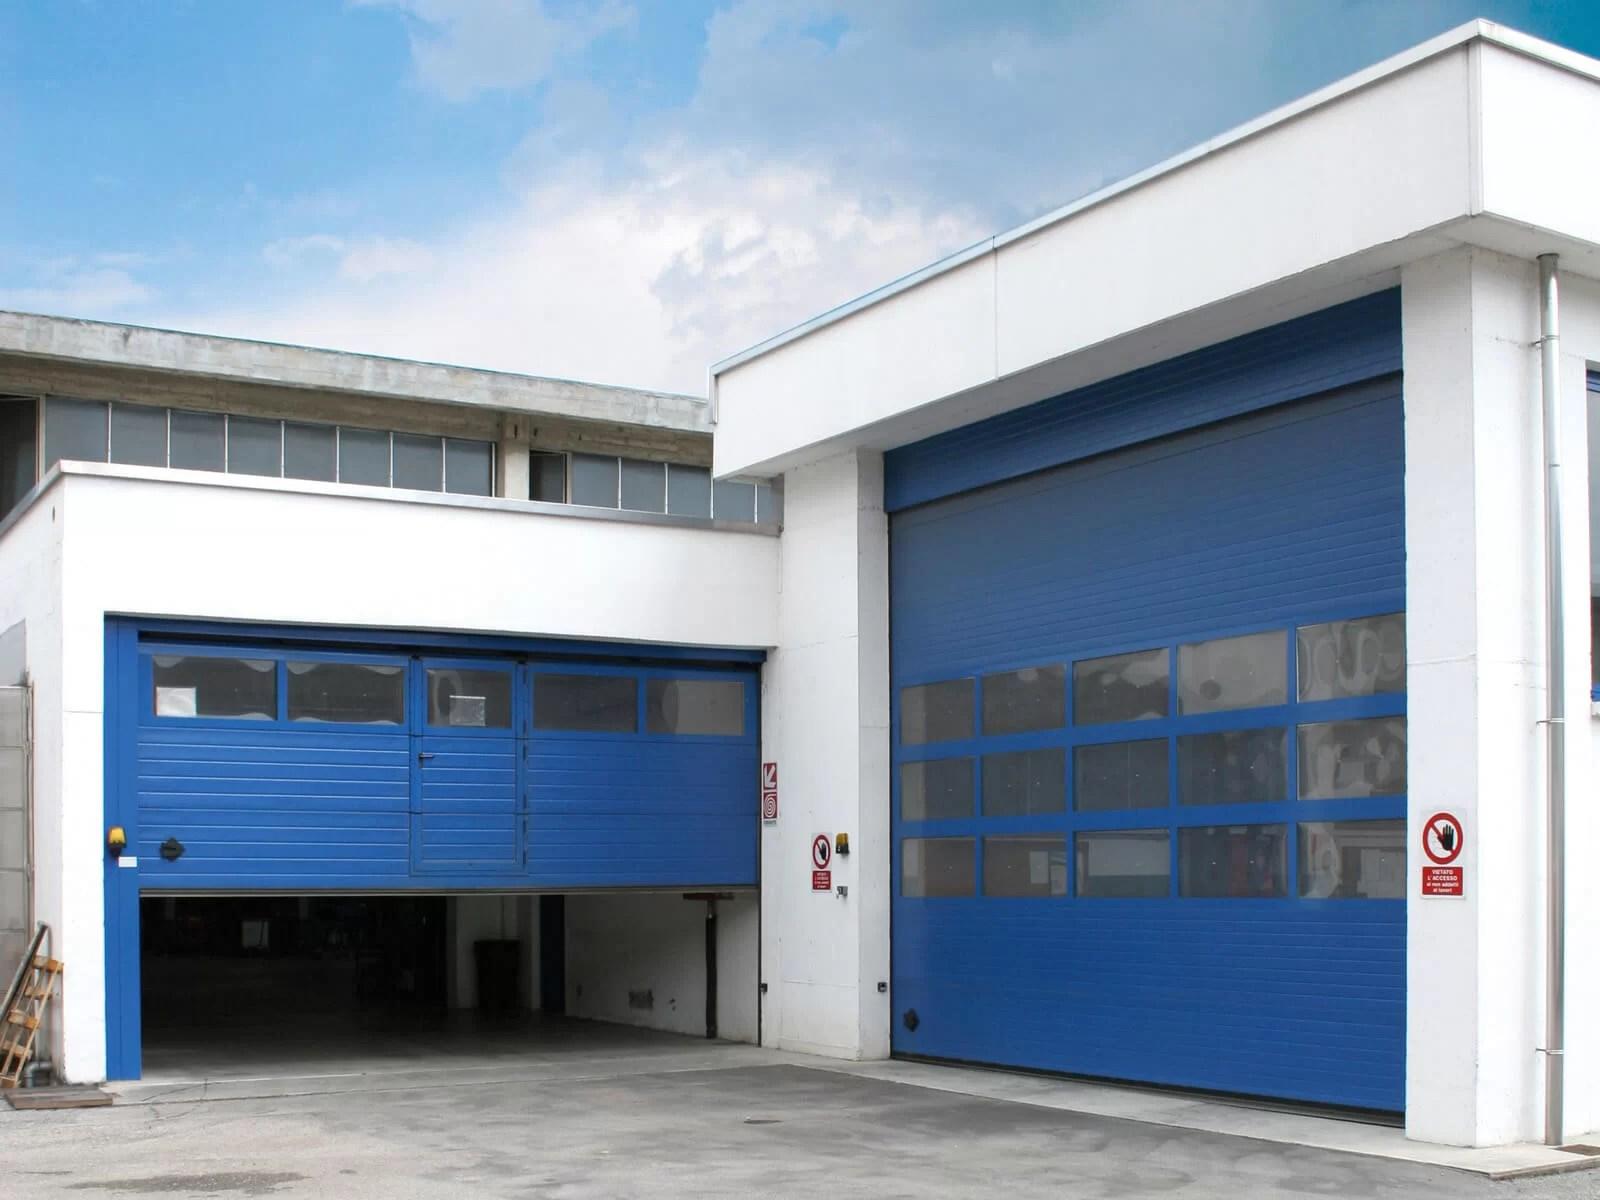 Portone sezionale industriale SECURA - Stucco blu RAL 5010 Visa porta pedonale